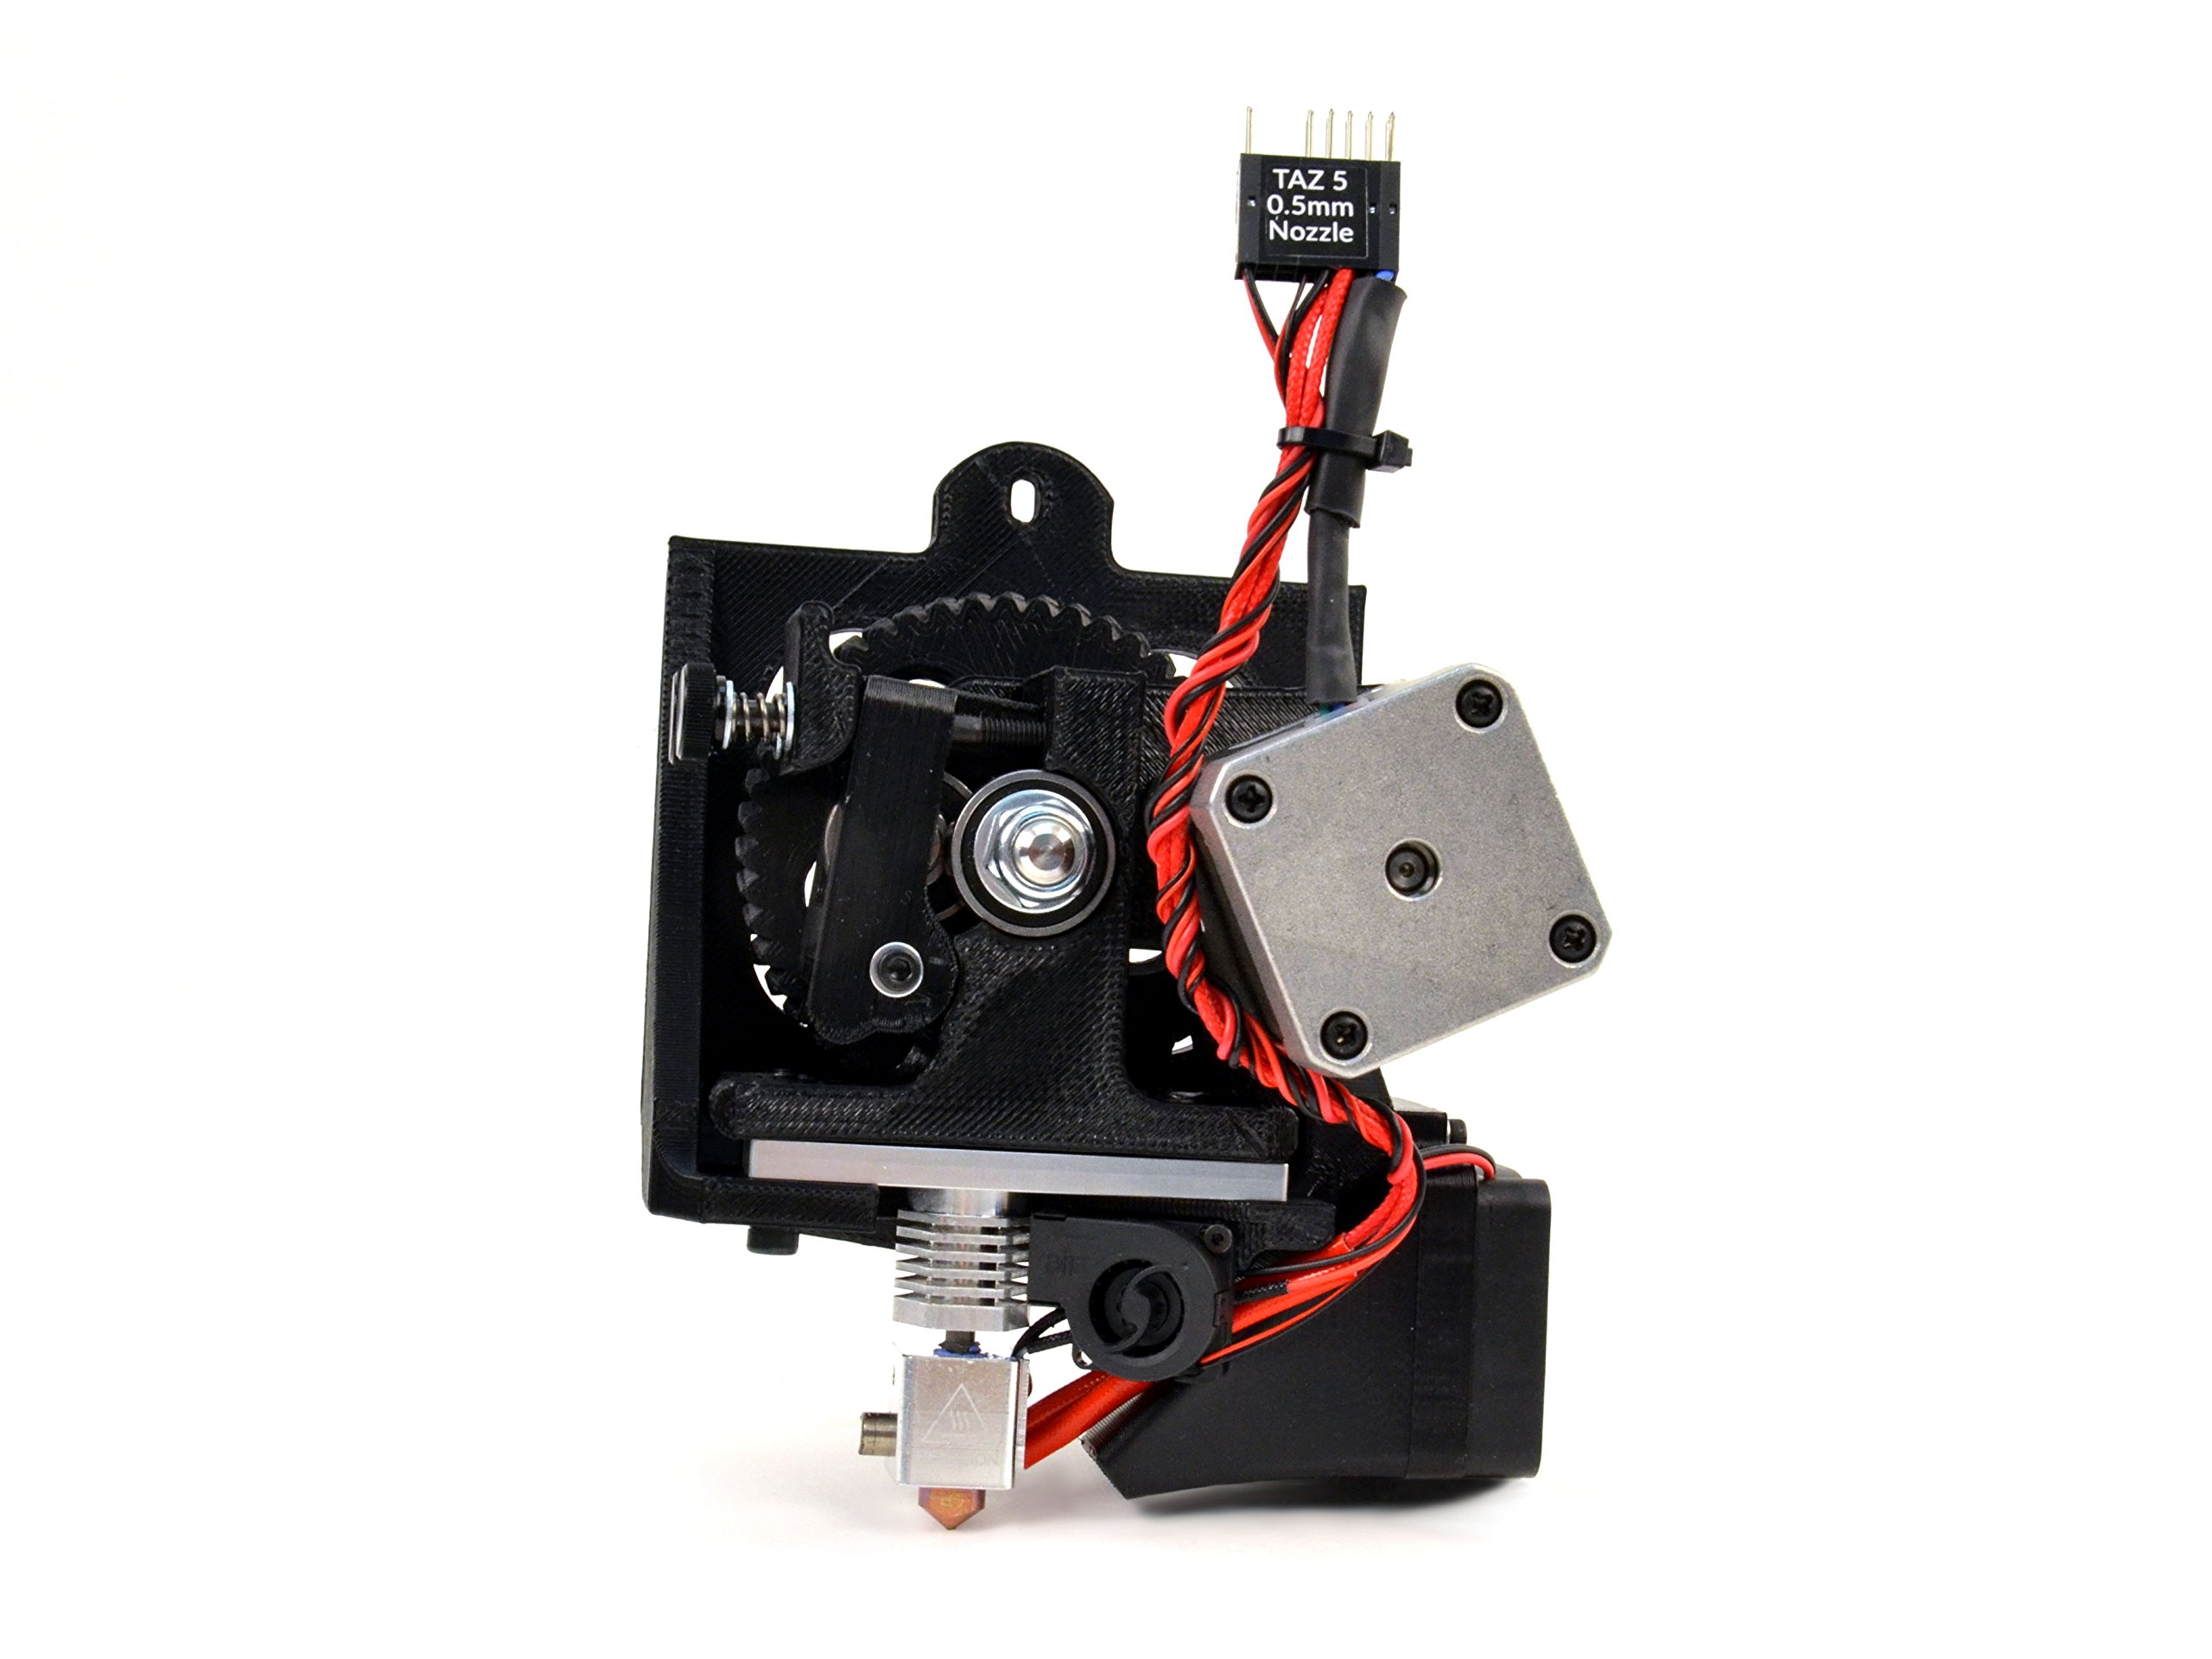 LulzBot TAZ Single Extruder Tool Head V2c, 0.5 Nozzle